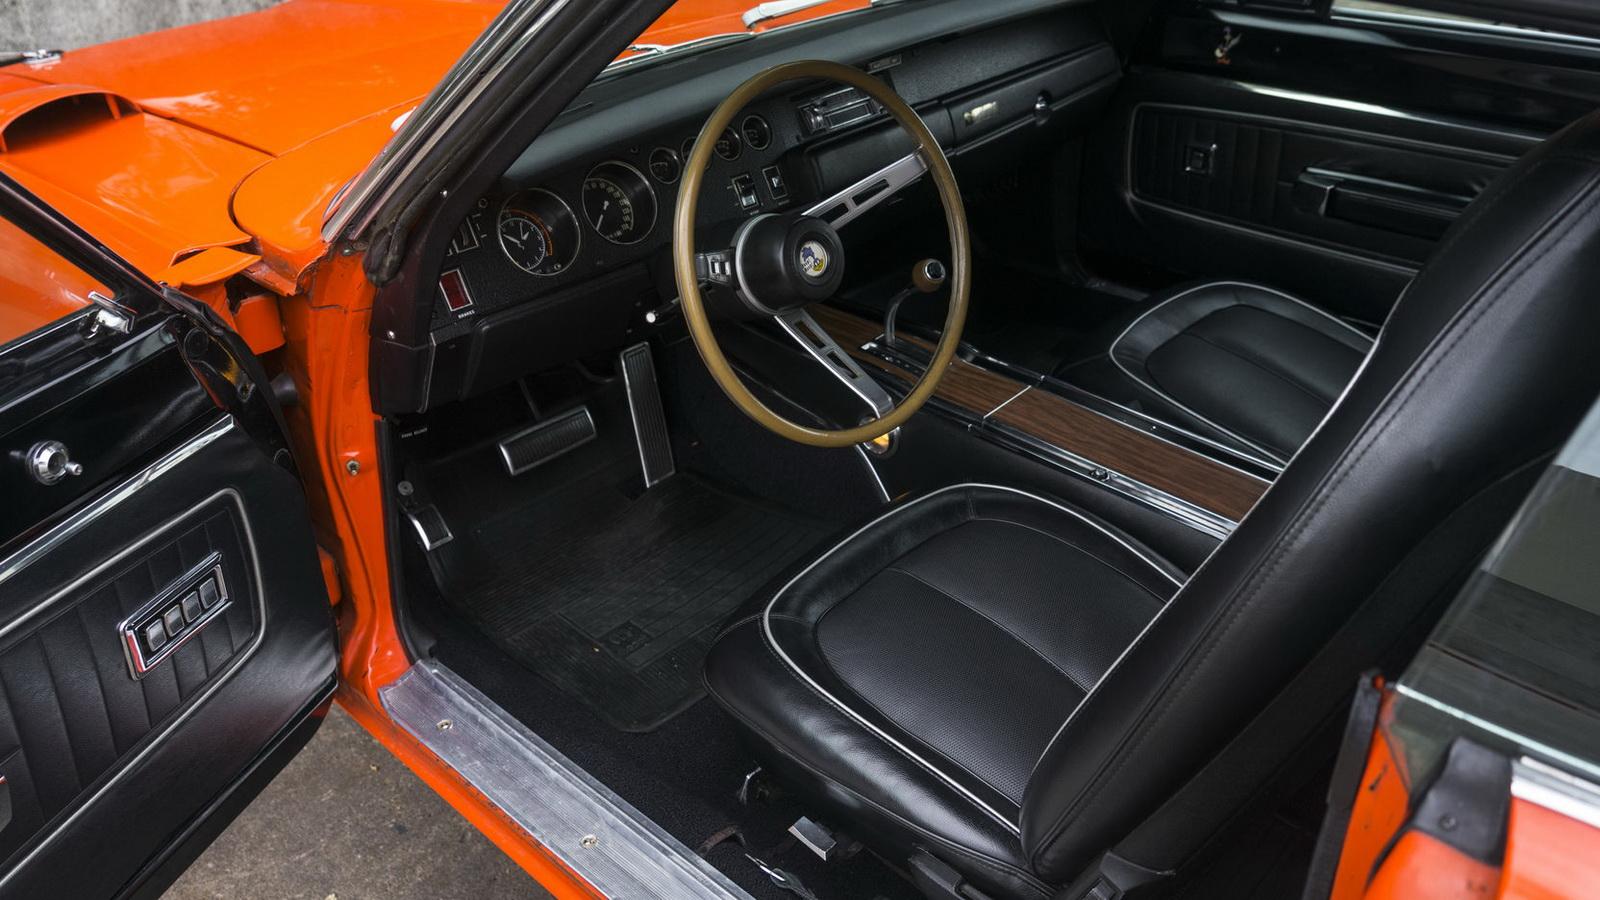 Plymouth Hemi Superbird 1970 in auction (4)